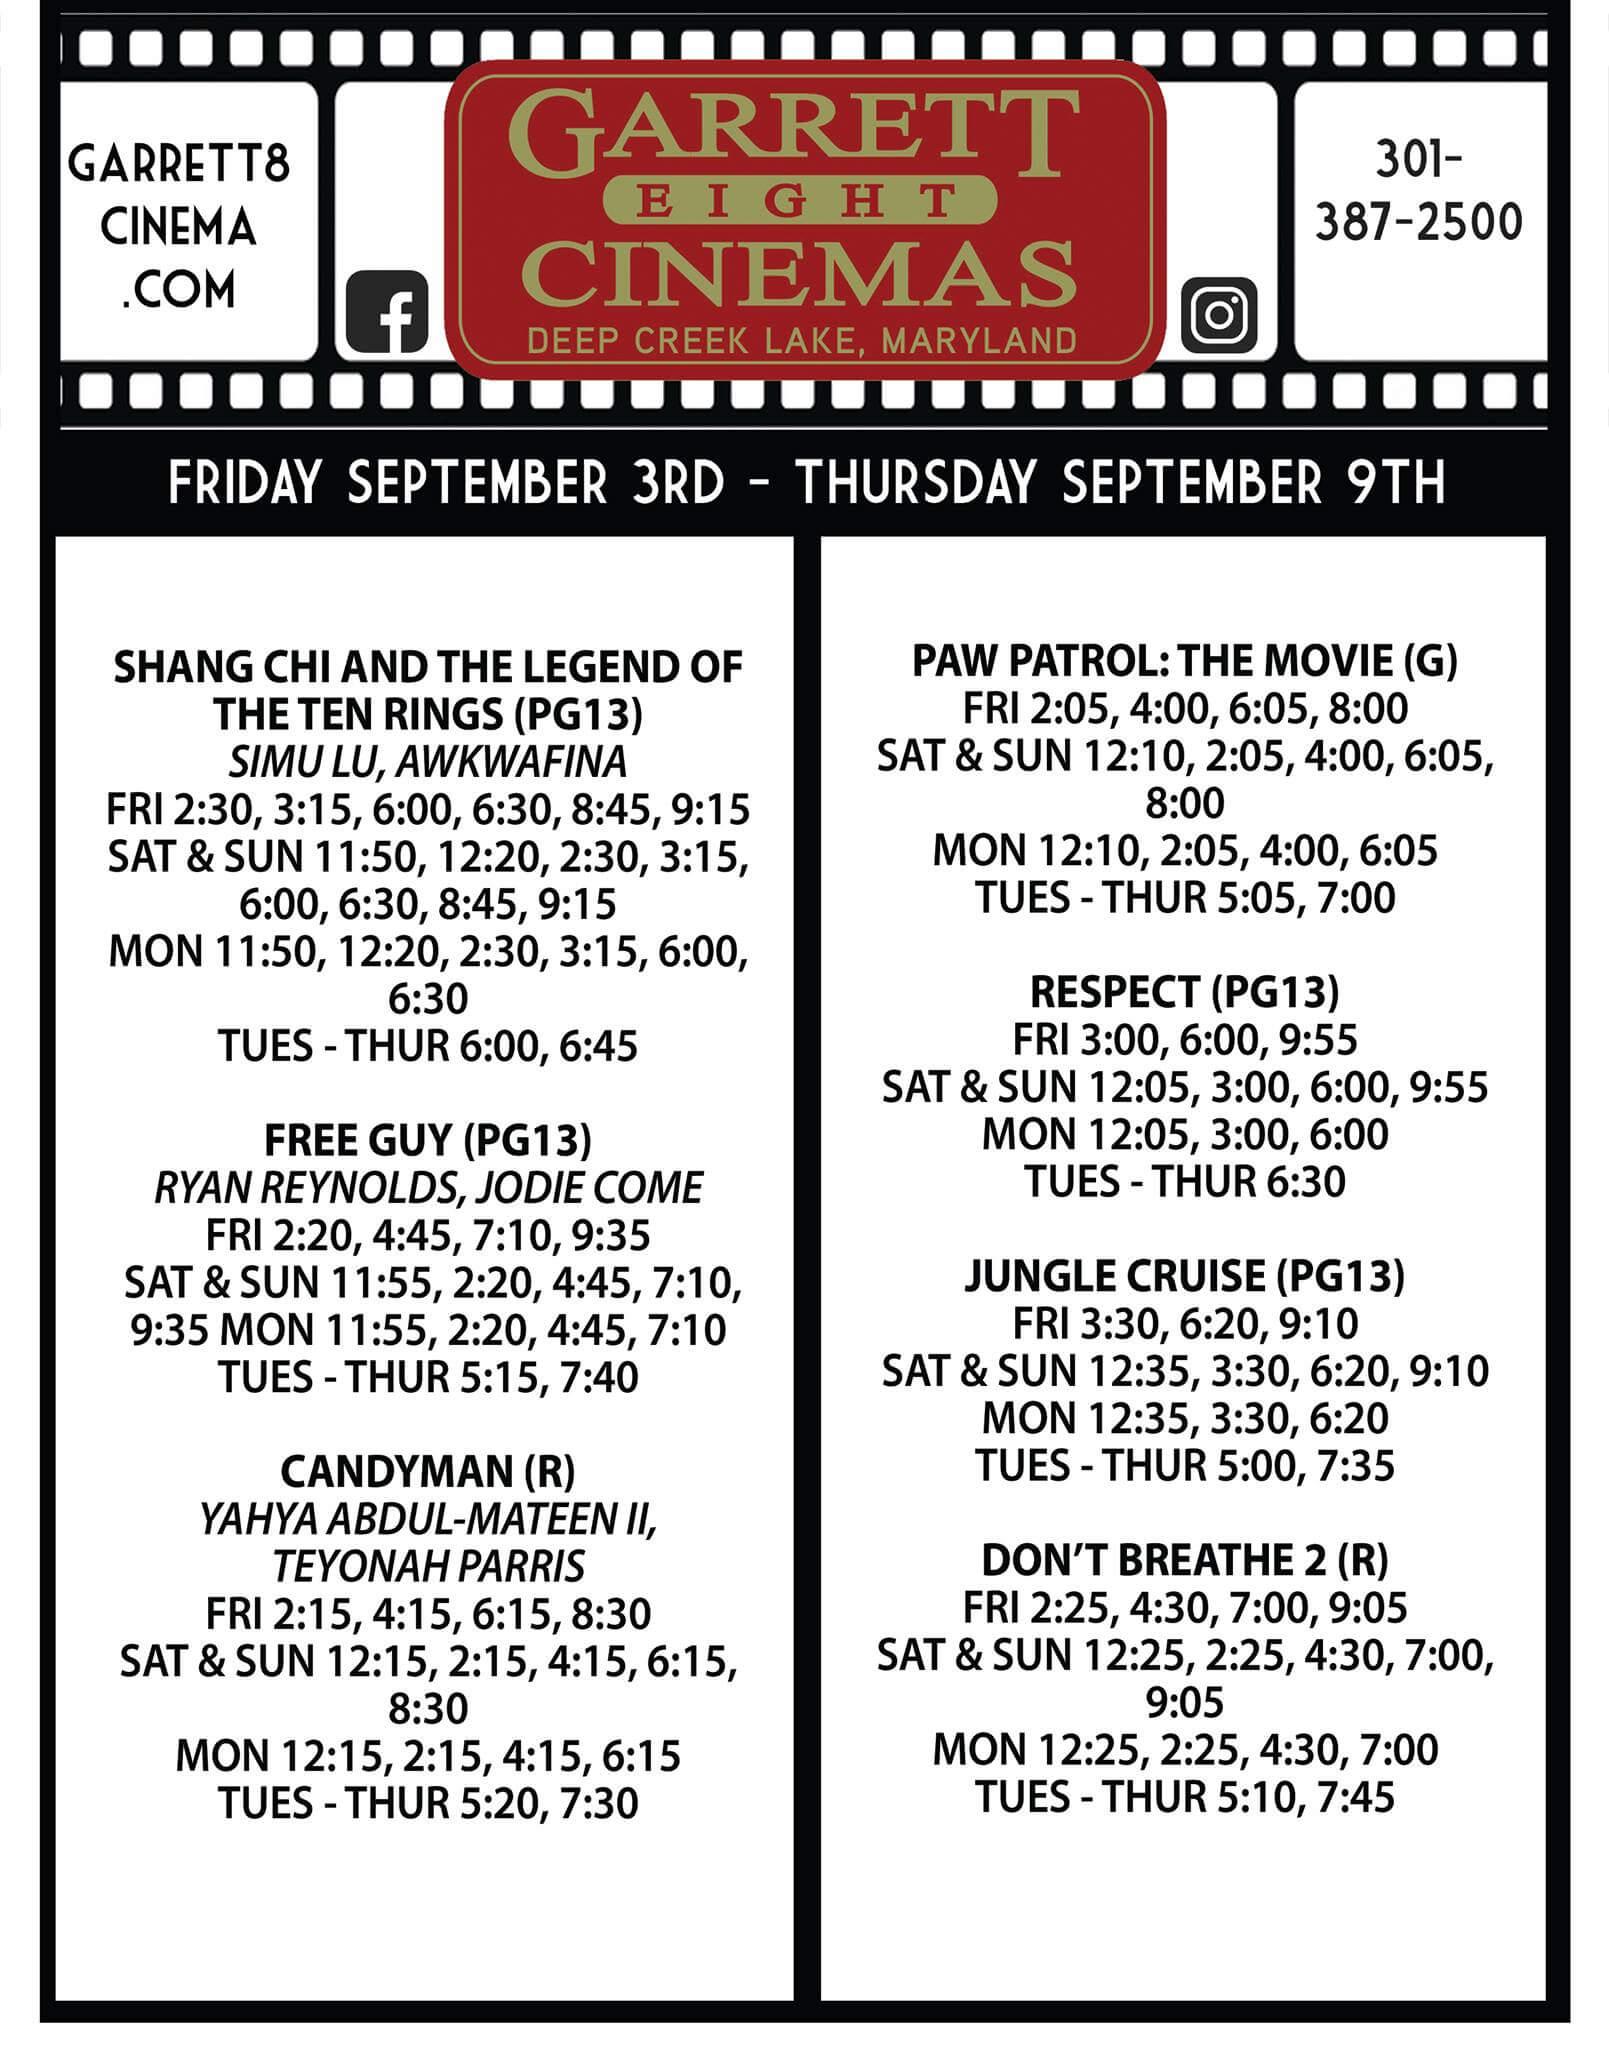 Garrett 8 Cinemas Movie List (03-09 September)